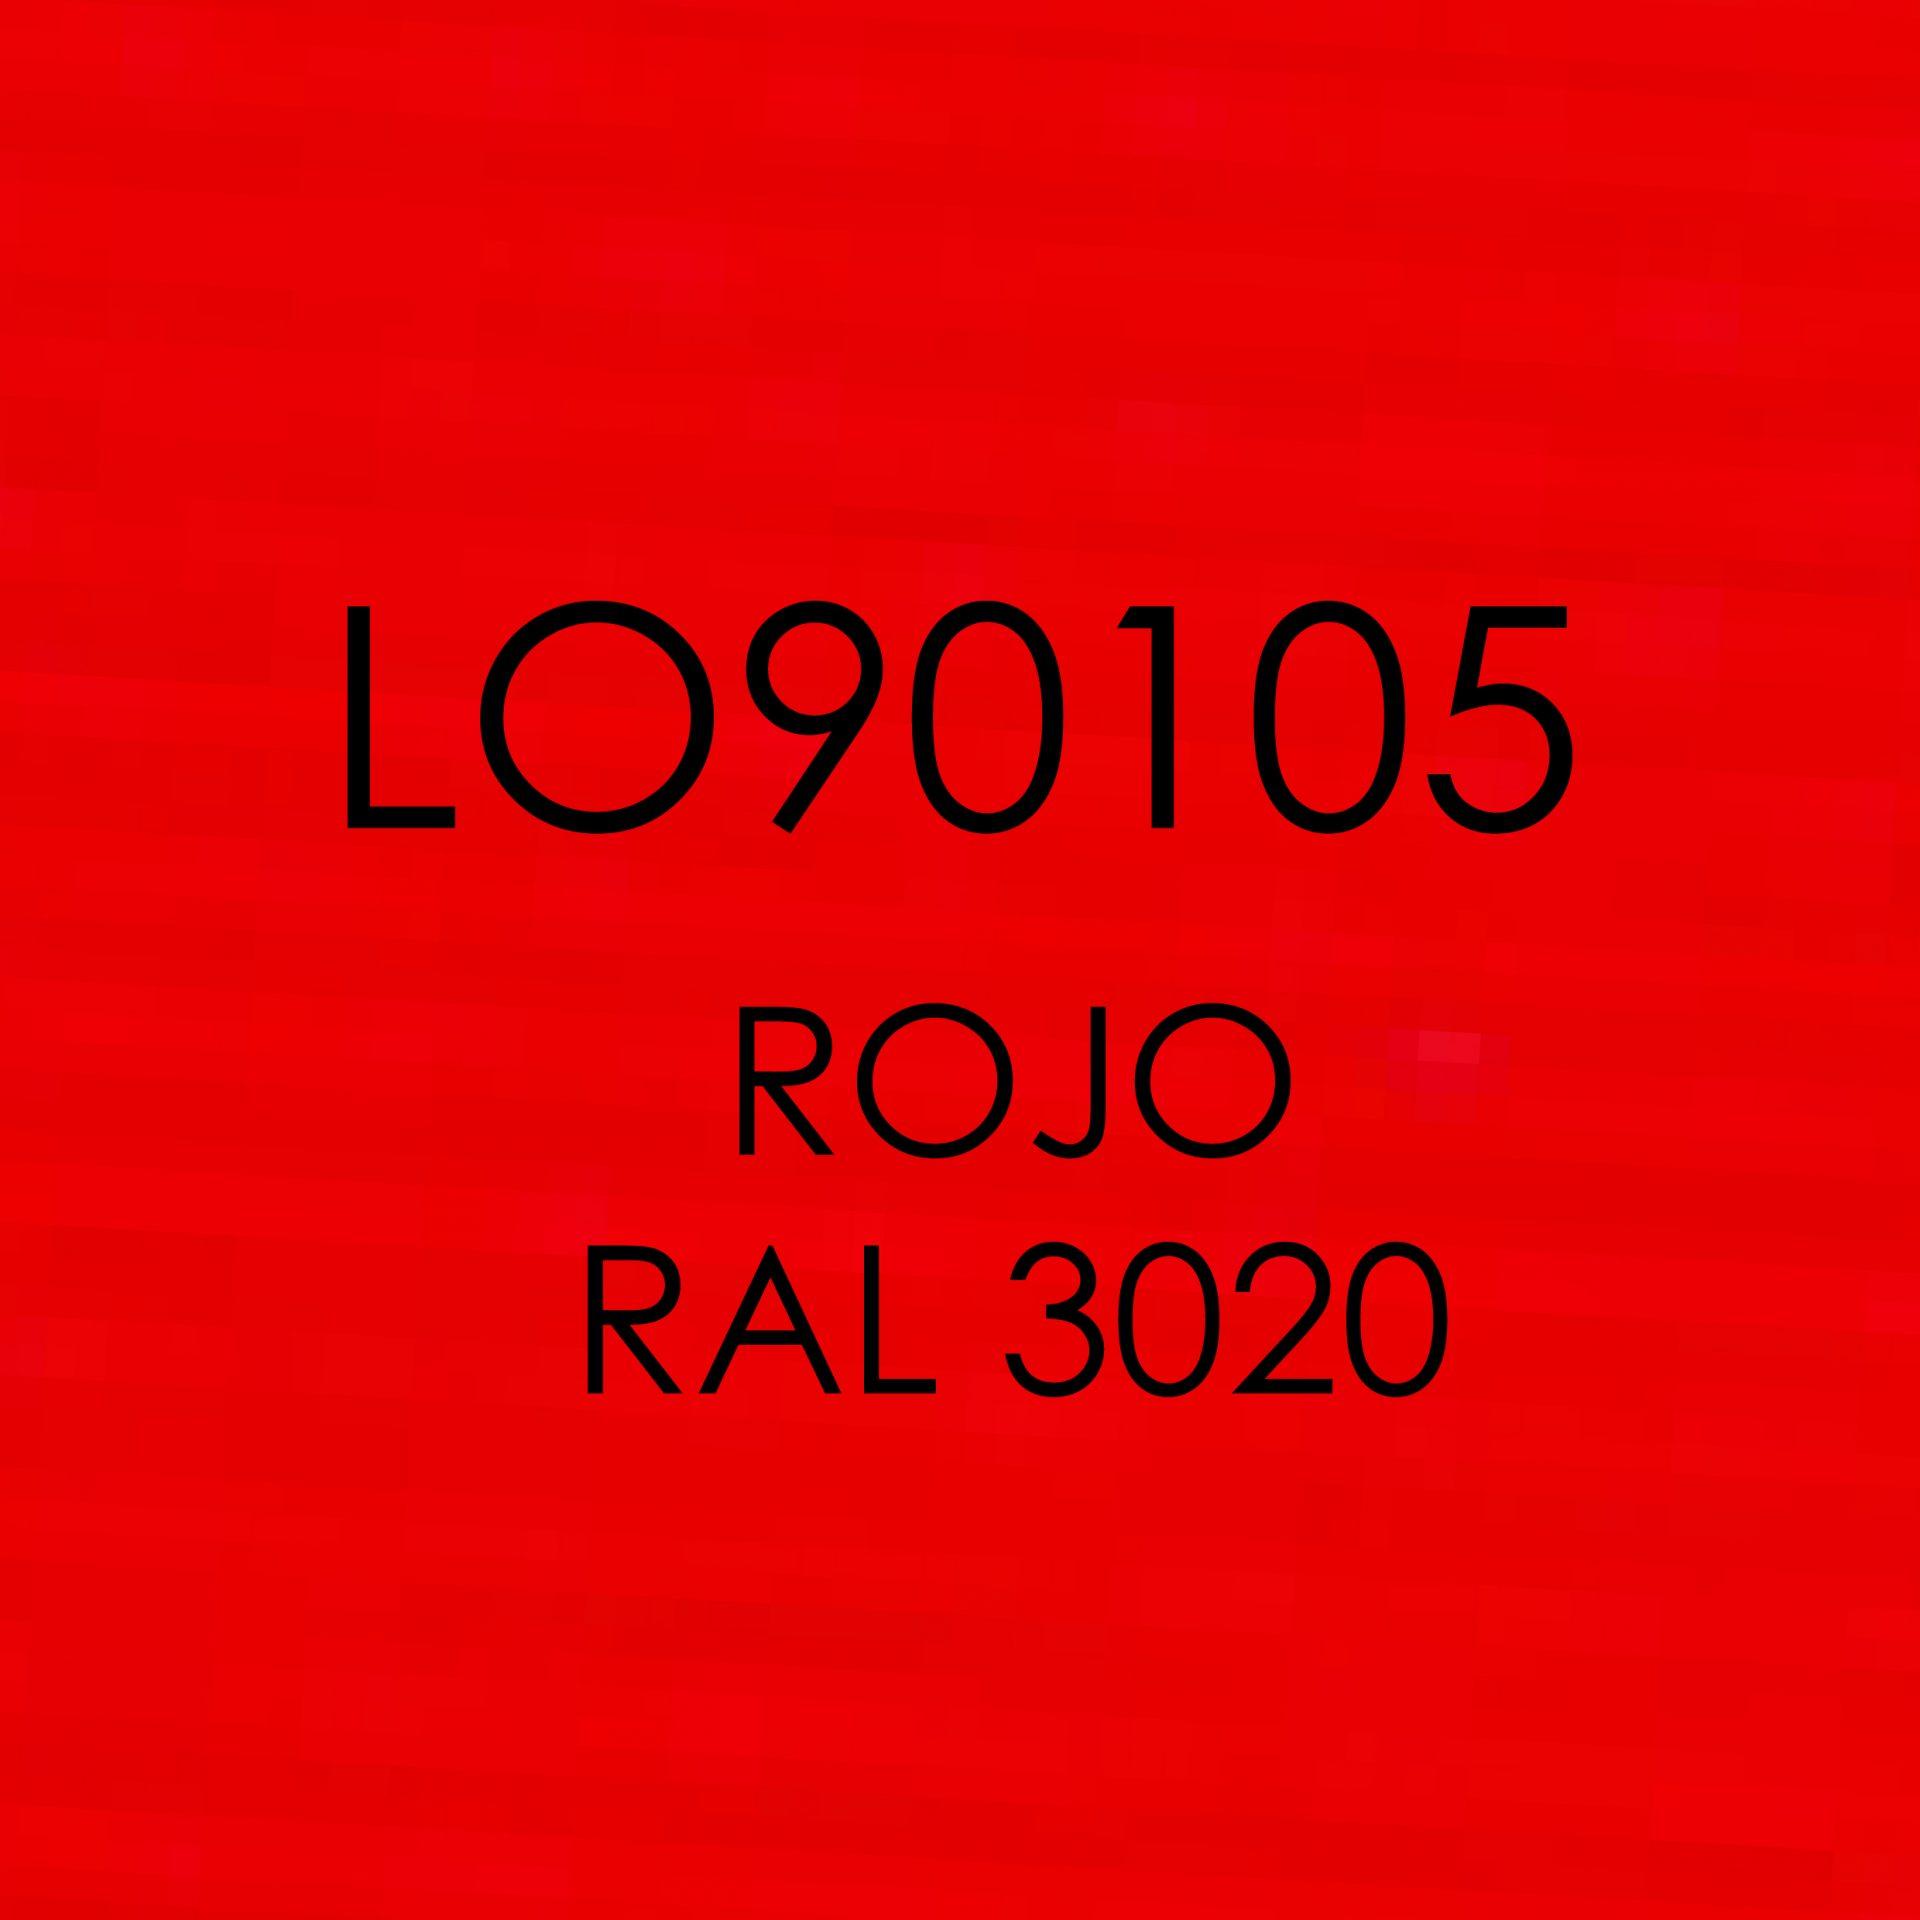 LO90105